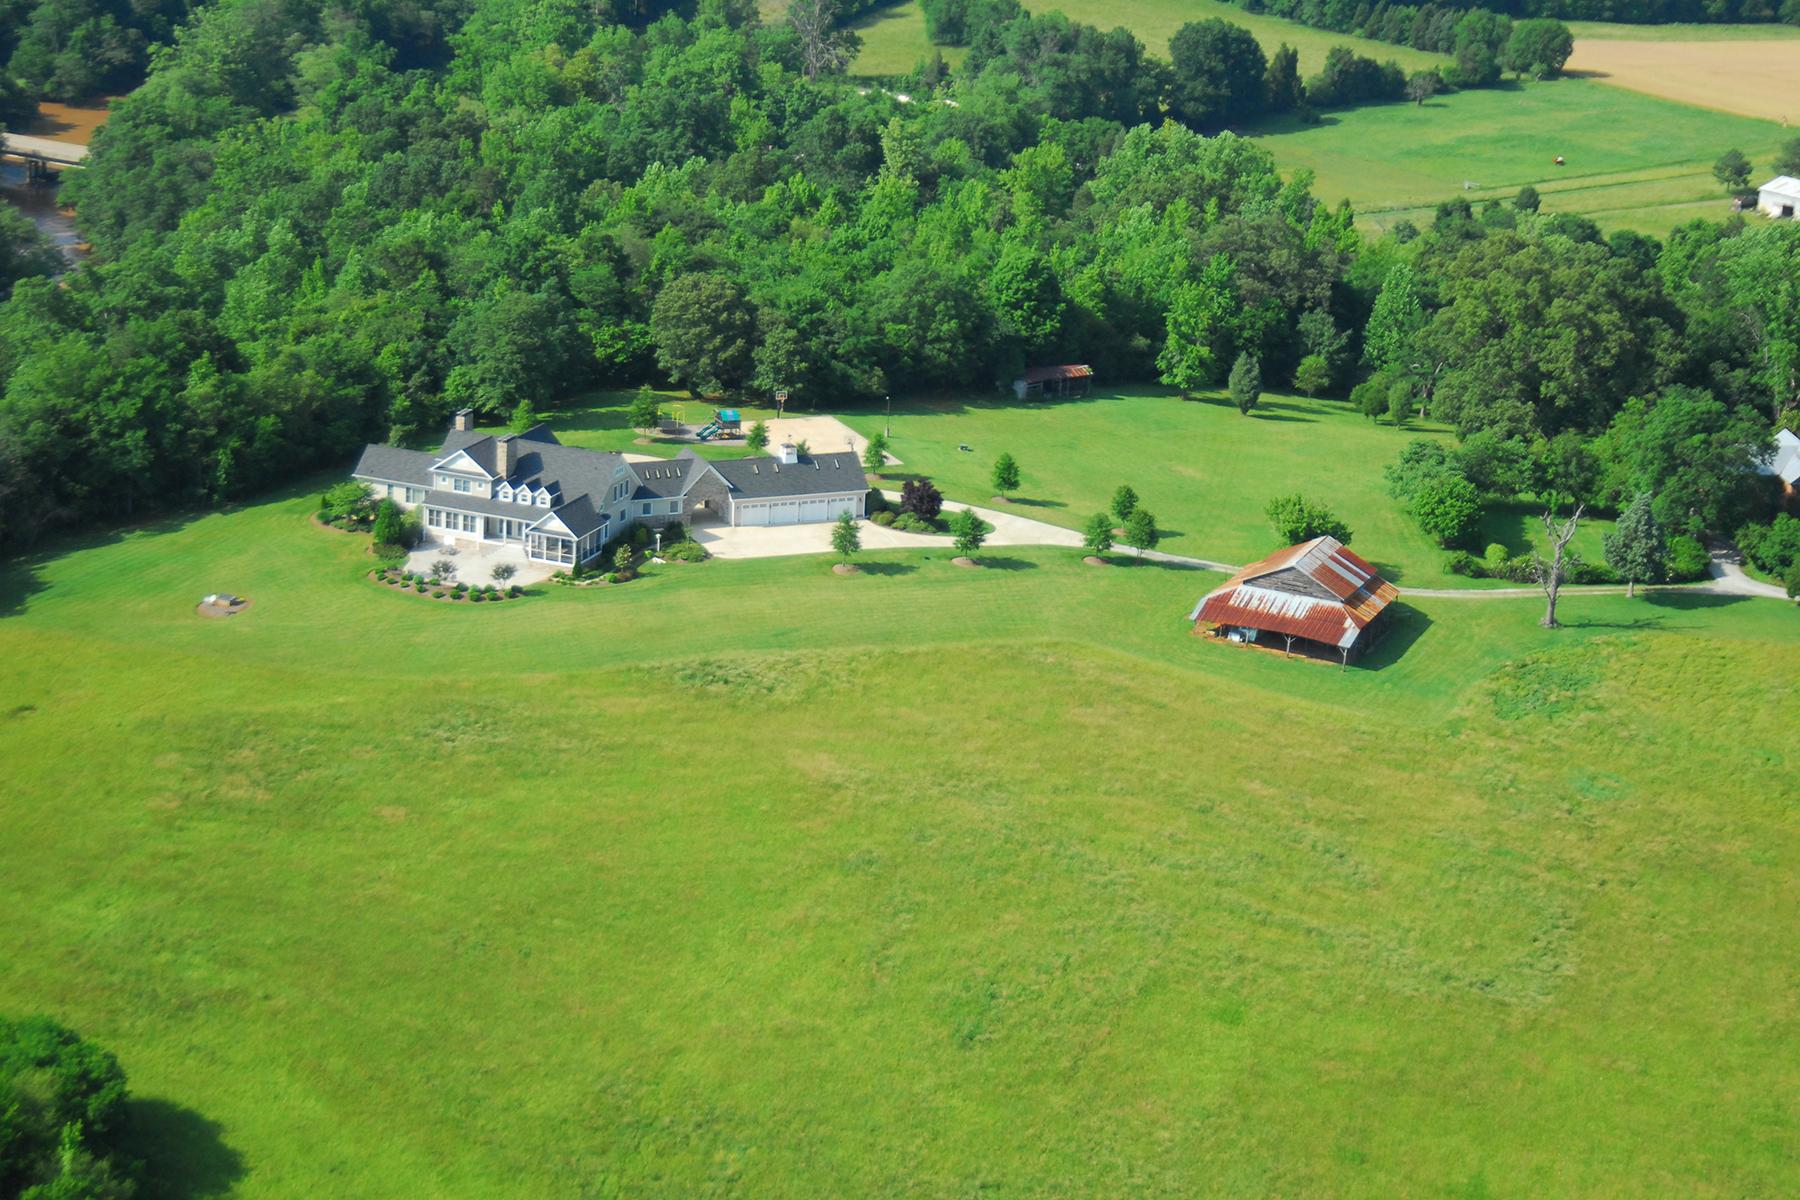 Single Family Home for Sale at SALISBURY 8665 Us Hwy 601 Hwy Salisbury, North Carolina, 28147 United States